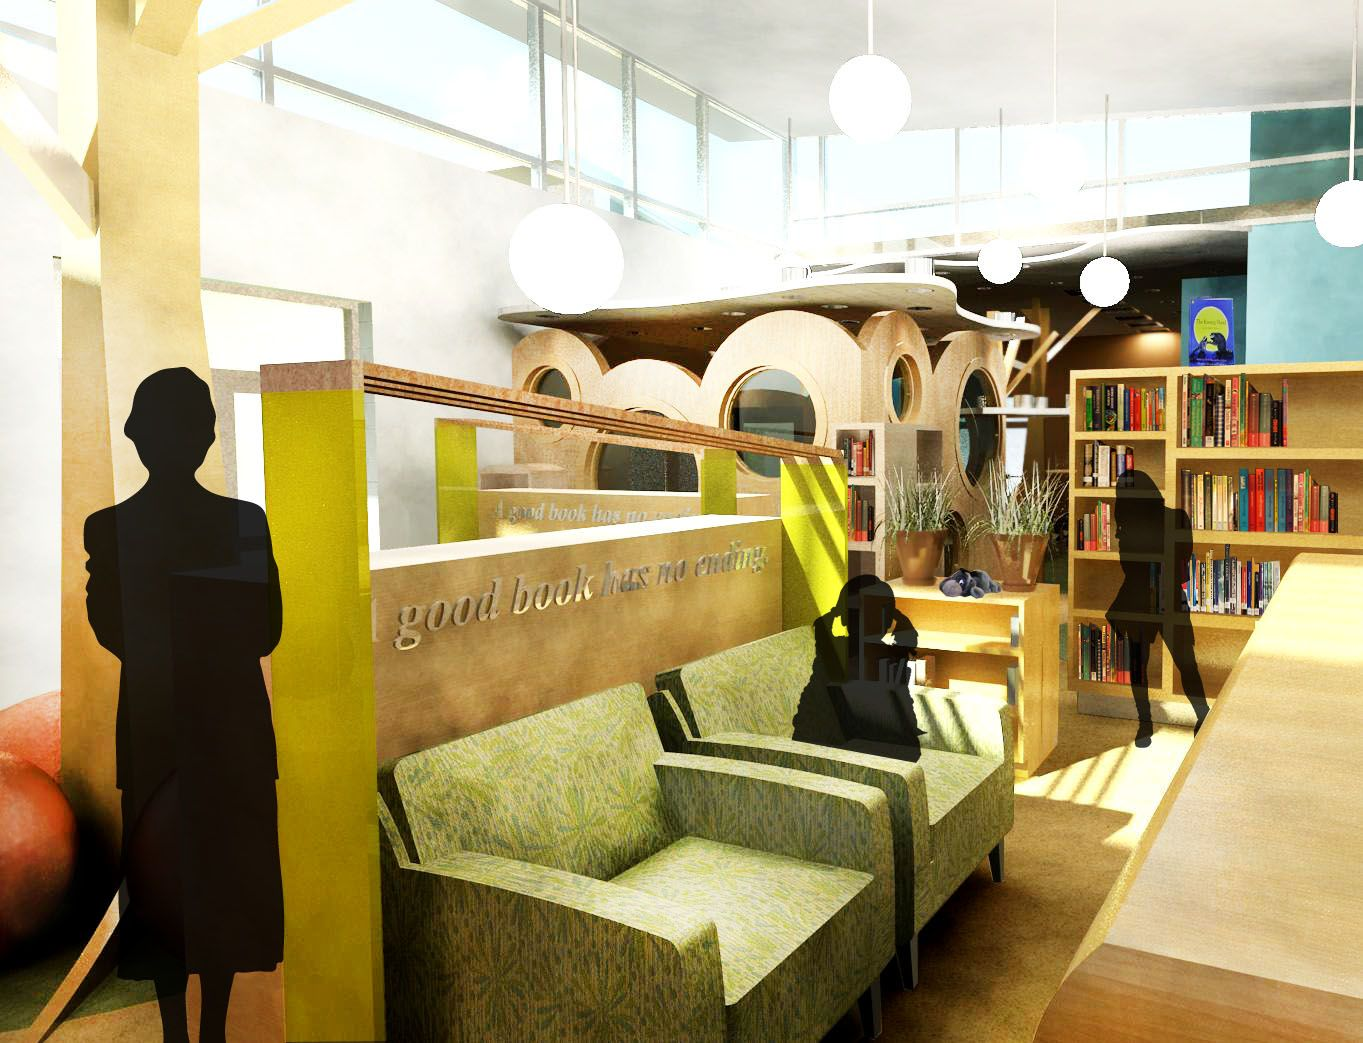 Library Design For School Professional Home Design High School Library  Design High School Library Design